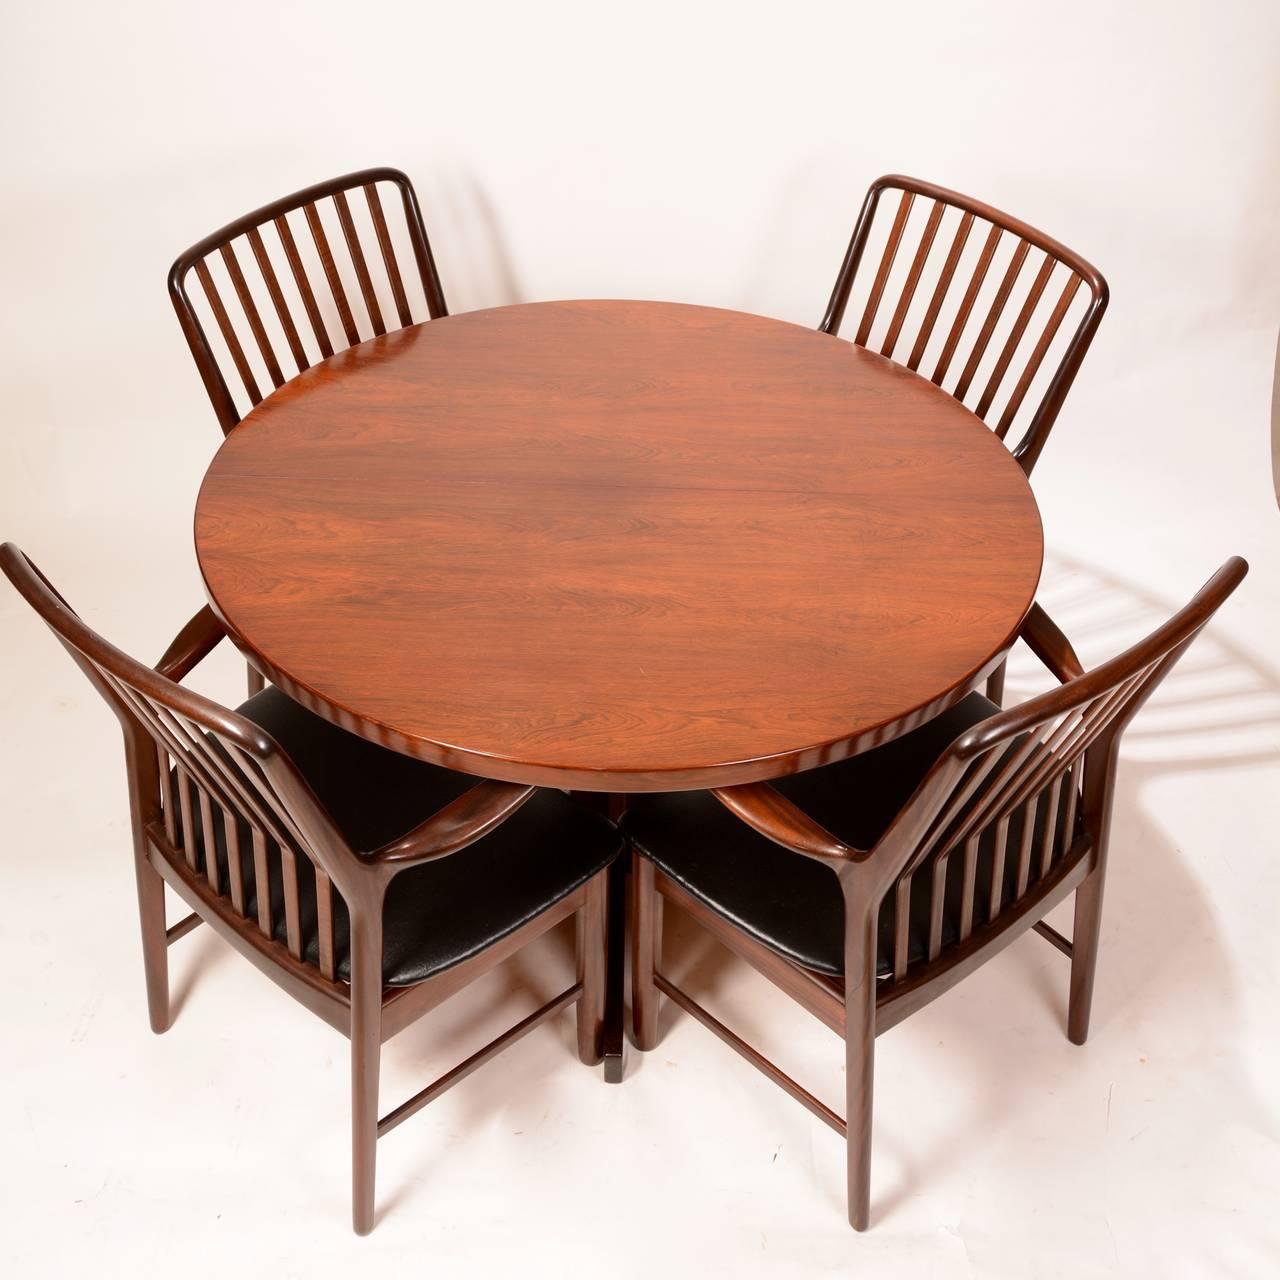 Mid-Century Modern Skovmand & Andersen for Moreddi Rosewood Dining Table 6